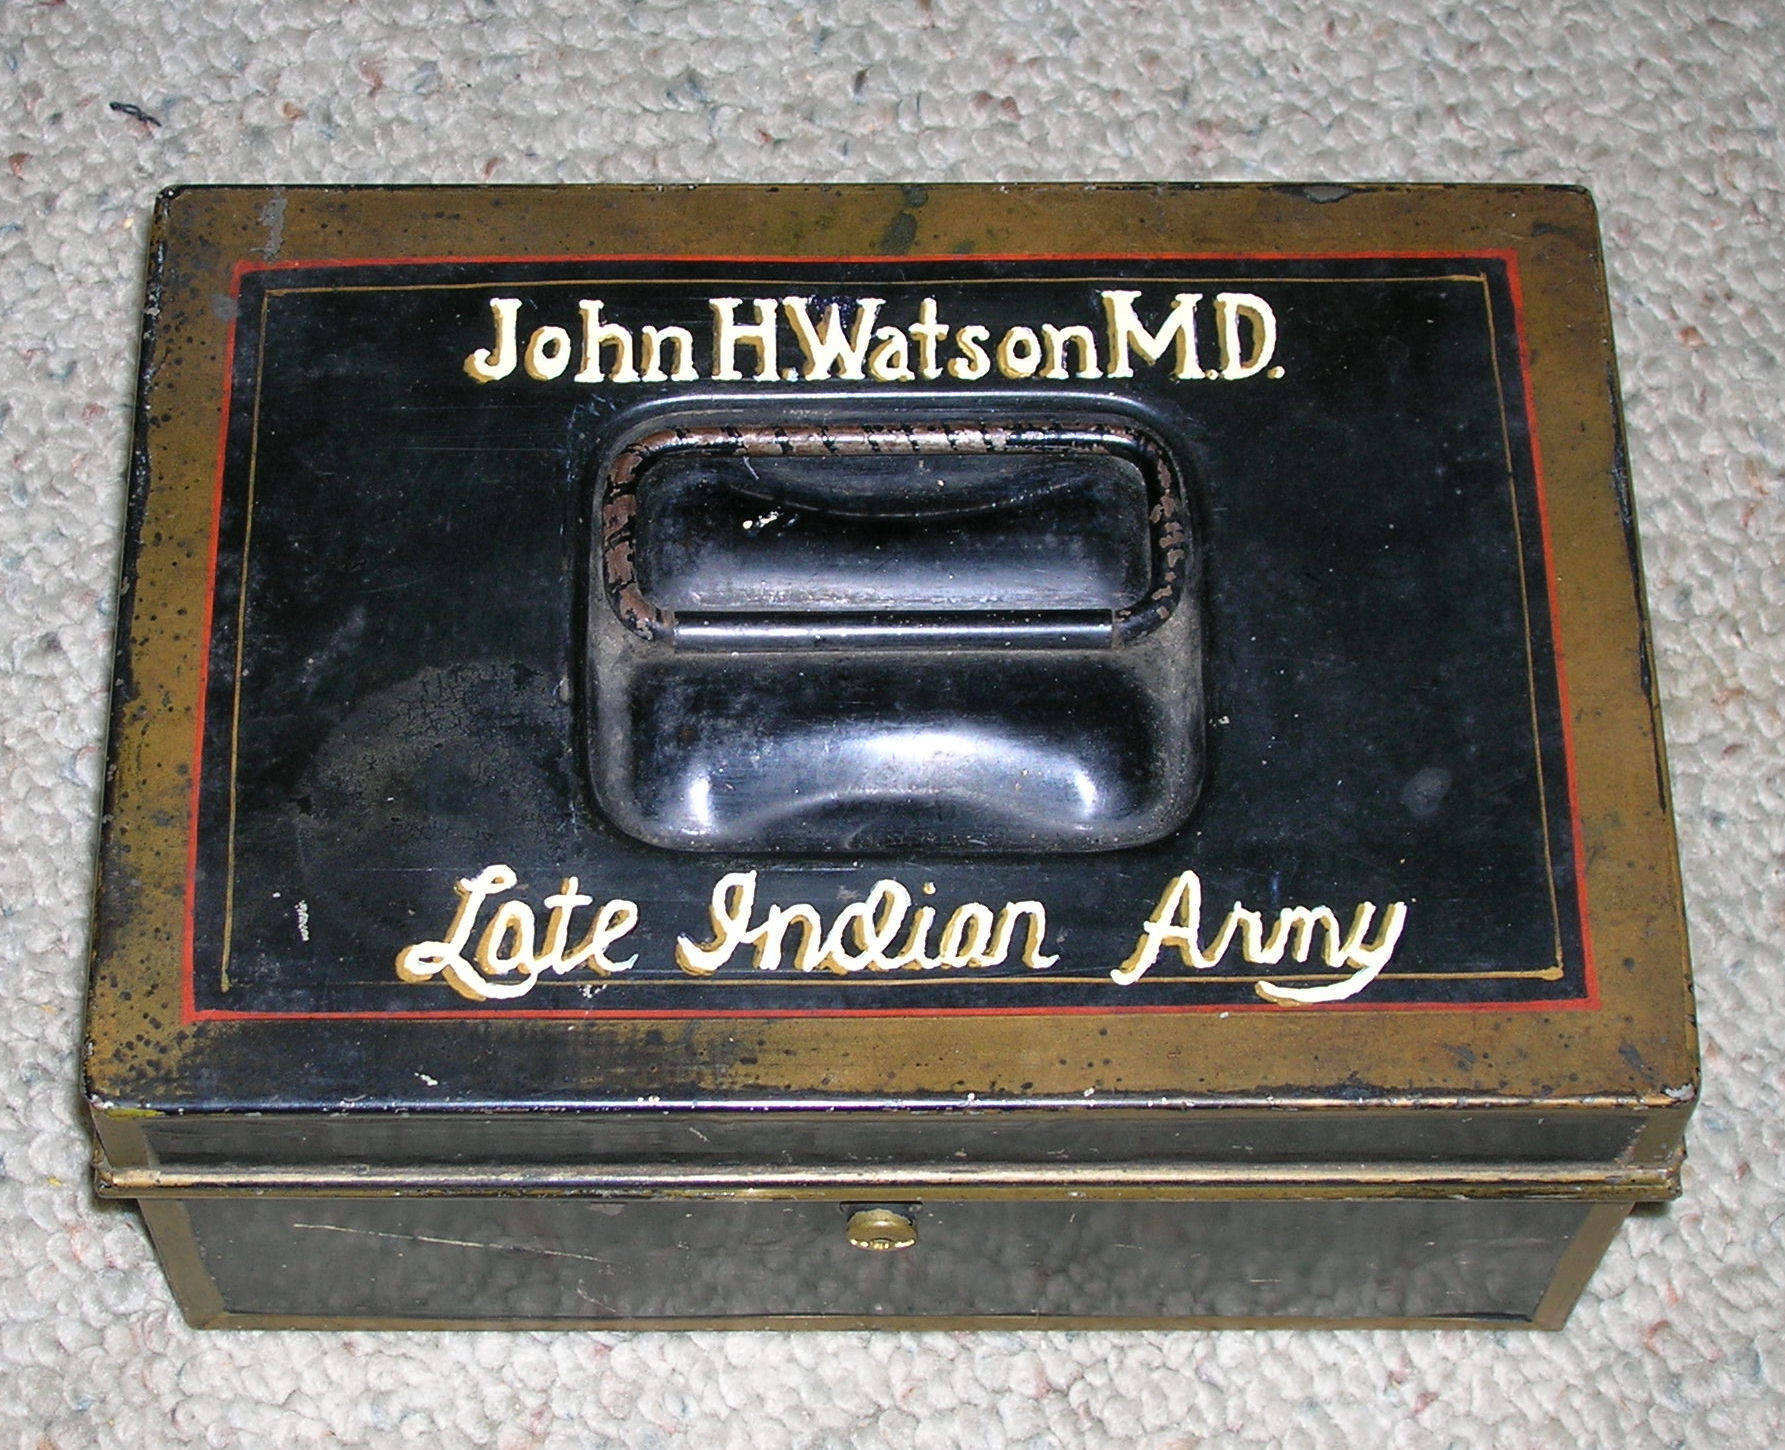 From Watson's Tin Box: The Engineer's Thumb